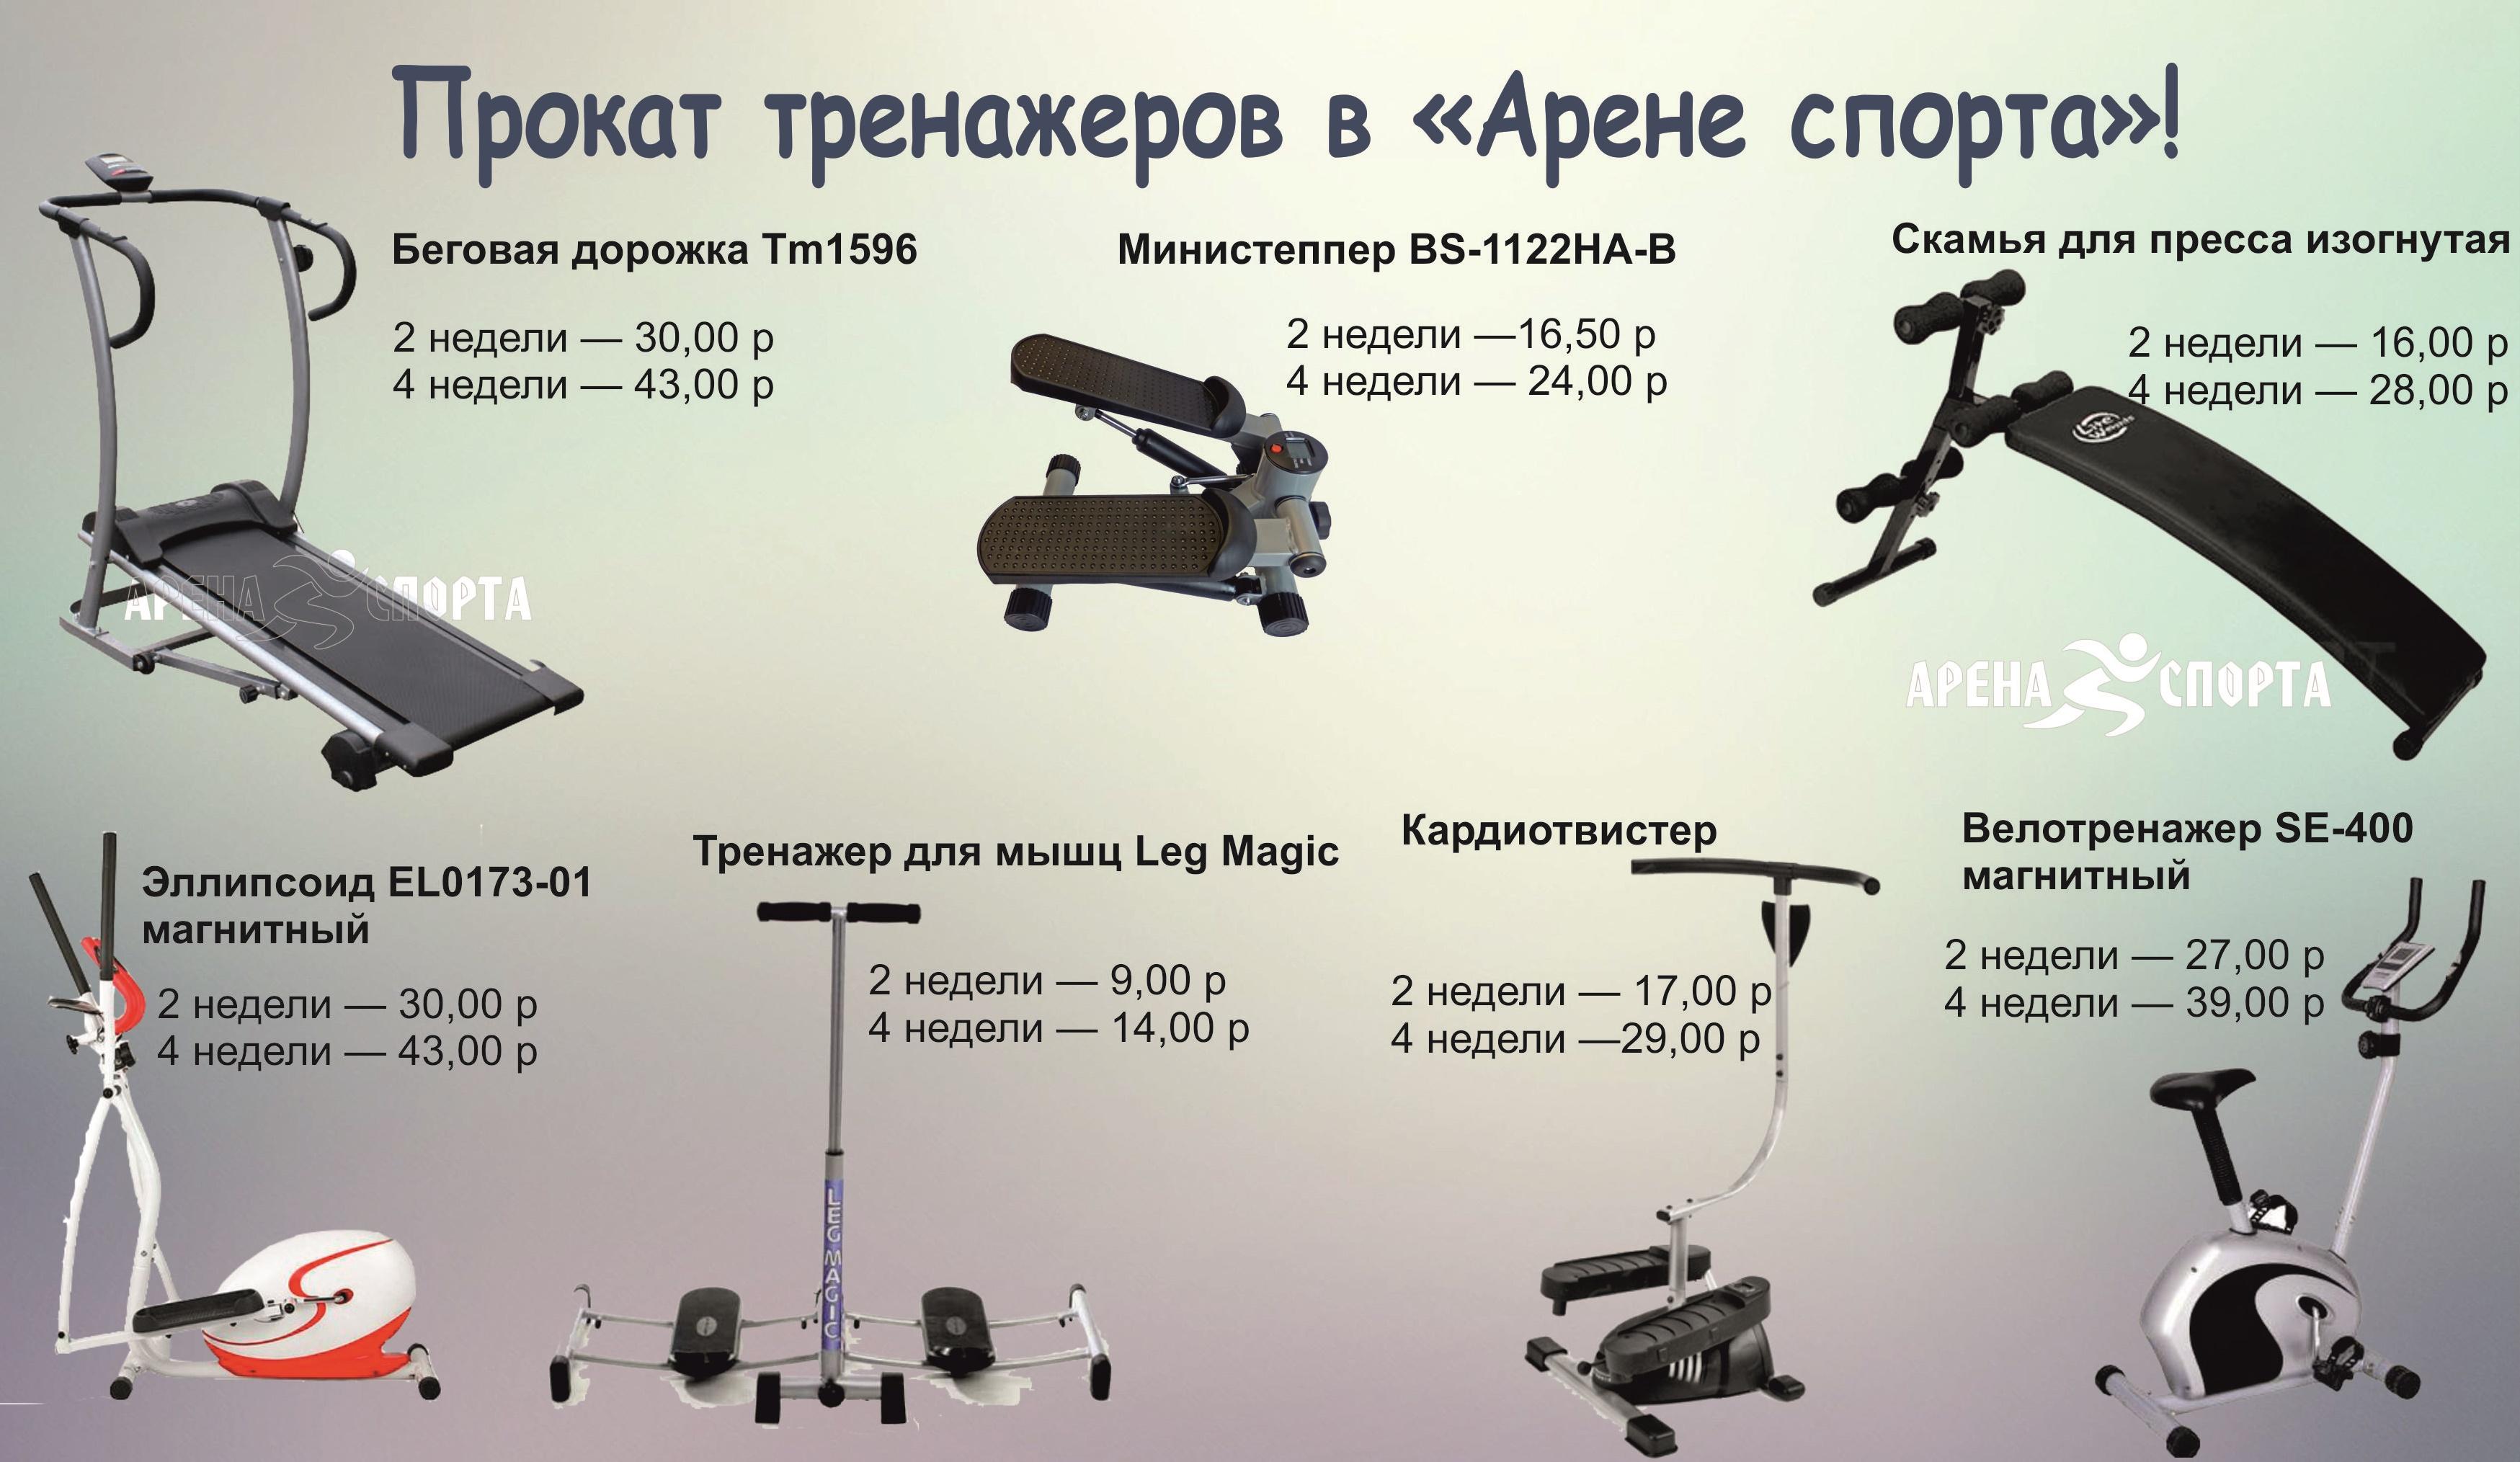 http://arena-sporta.by/prokat/prokat-sporttovarov